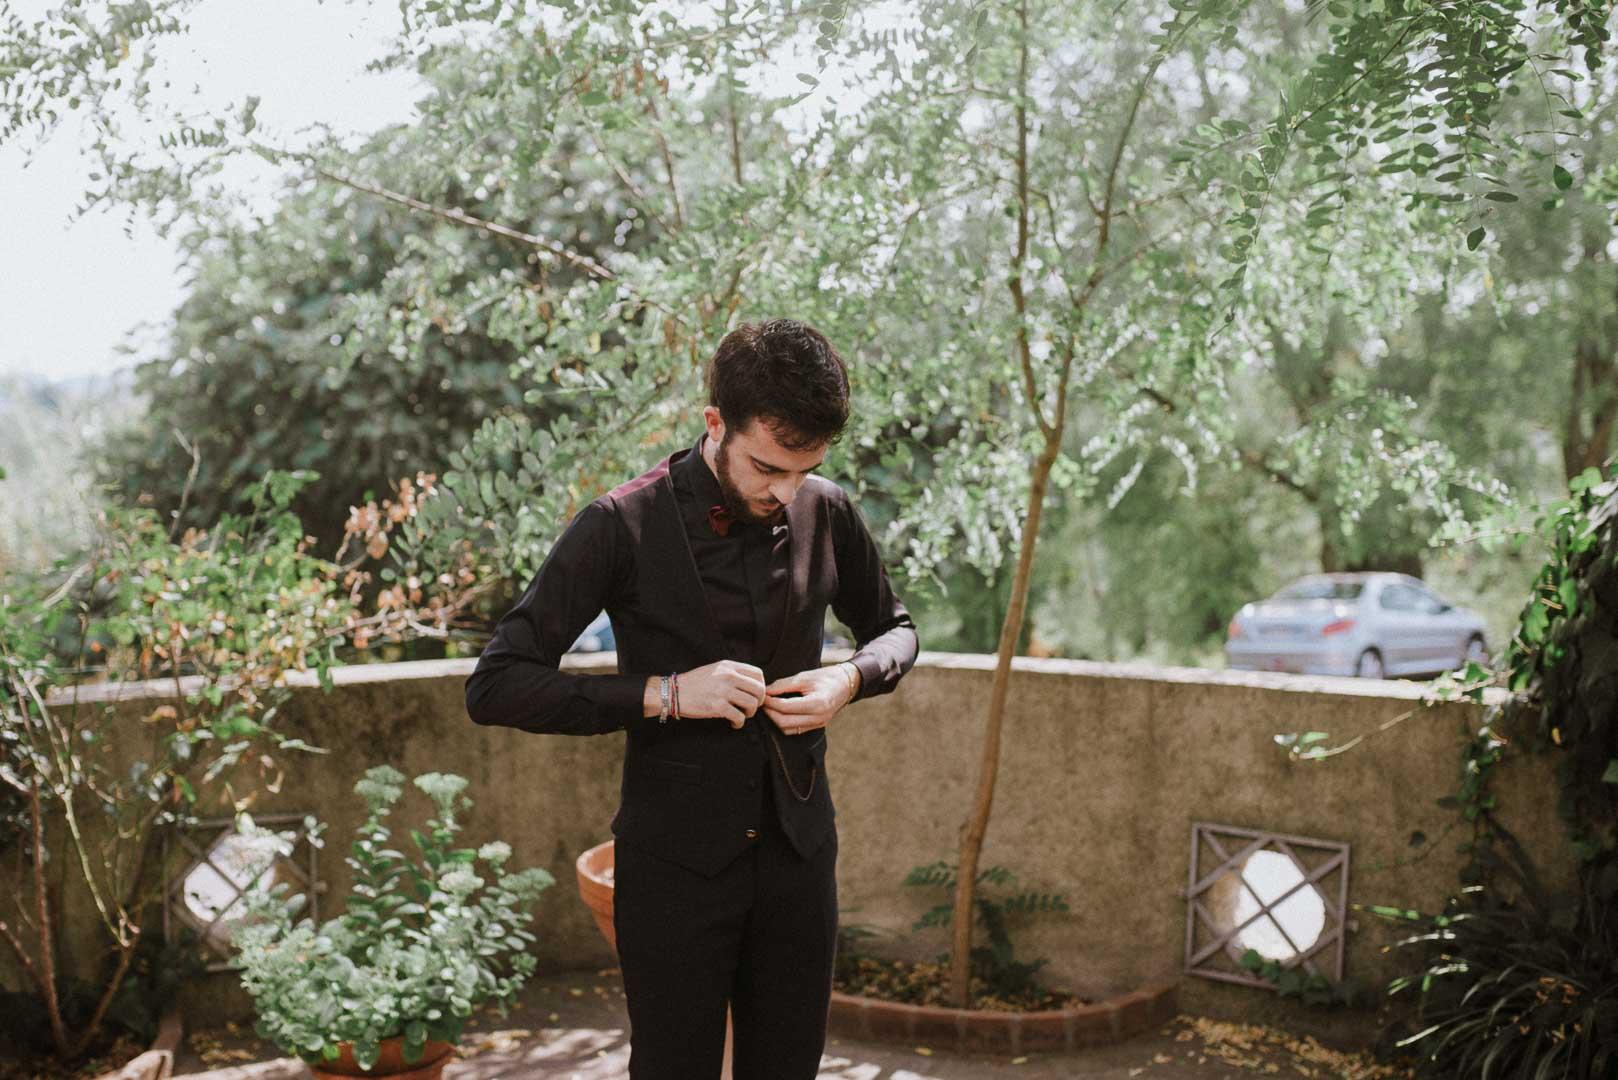 wedding-photographer-destination-fineart-bespoke-reportage-tuscany-villascorzi-vivianeizzo-spazio46-13